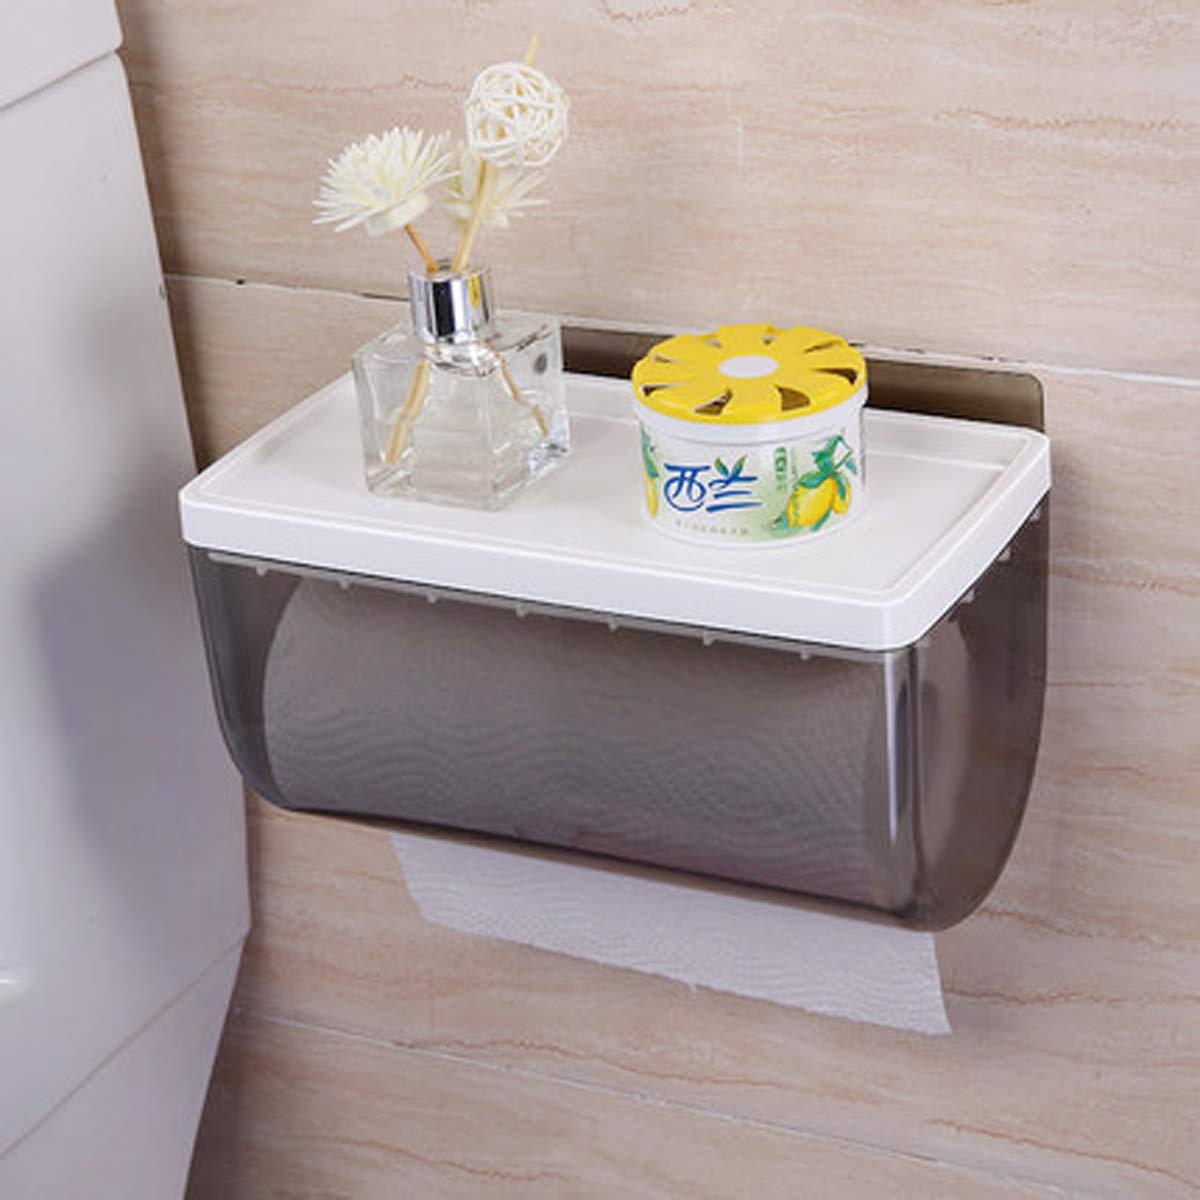 Q&F Wall Mount Toilet Paper Holder,Toilet Roll Holder,Tissue Roll Hanger-waterproof, Moisture Proof-plastic-B